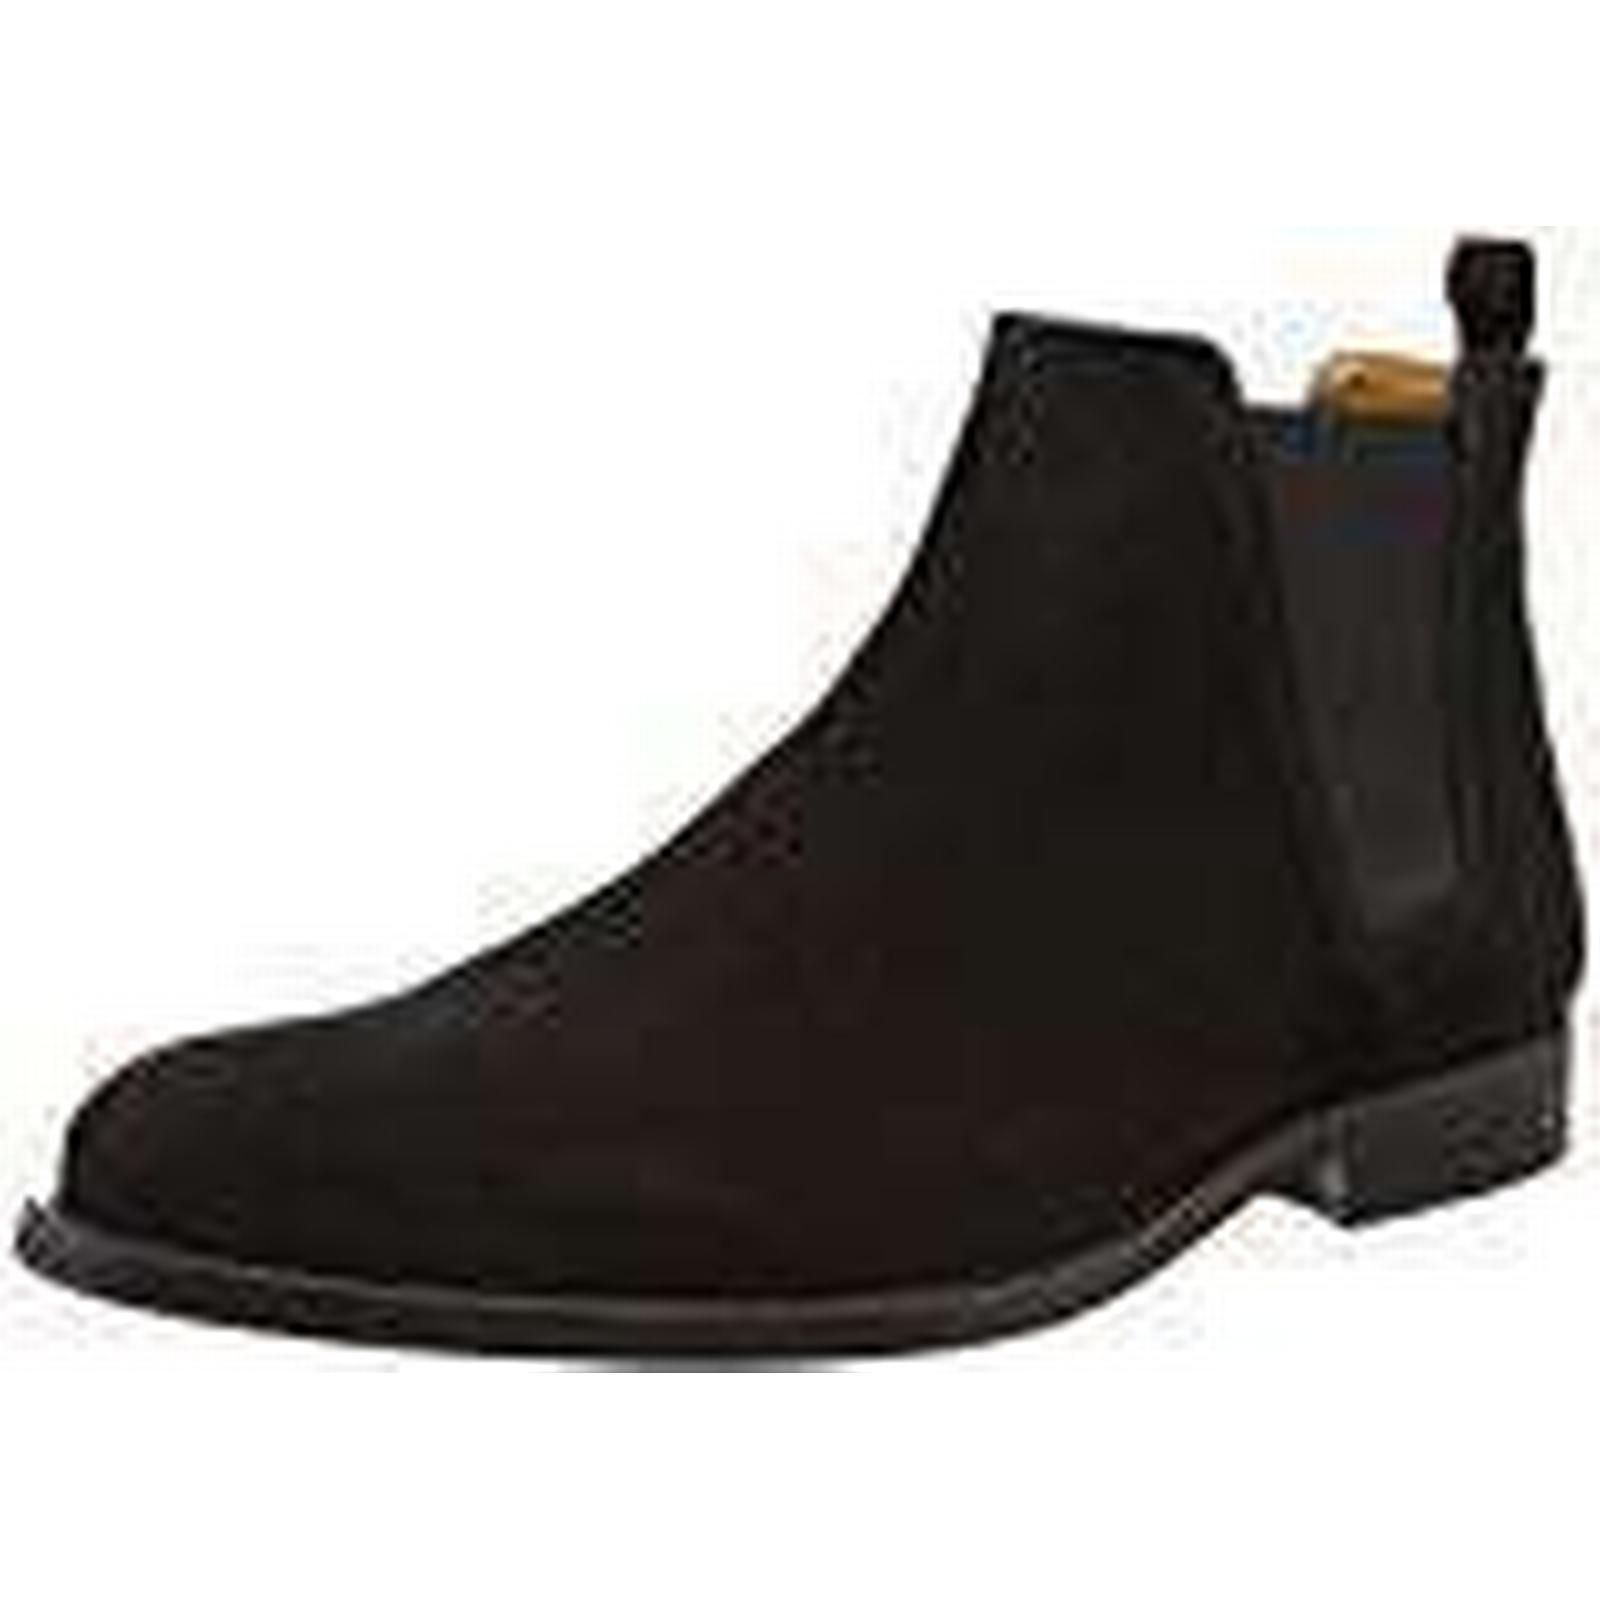 Aldo Men''s Vianello-R Chelsea UK Boots, (Black Suede), 12 UK Chelsea 46 EU ec9986